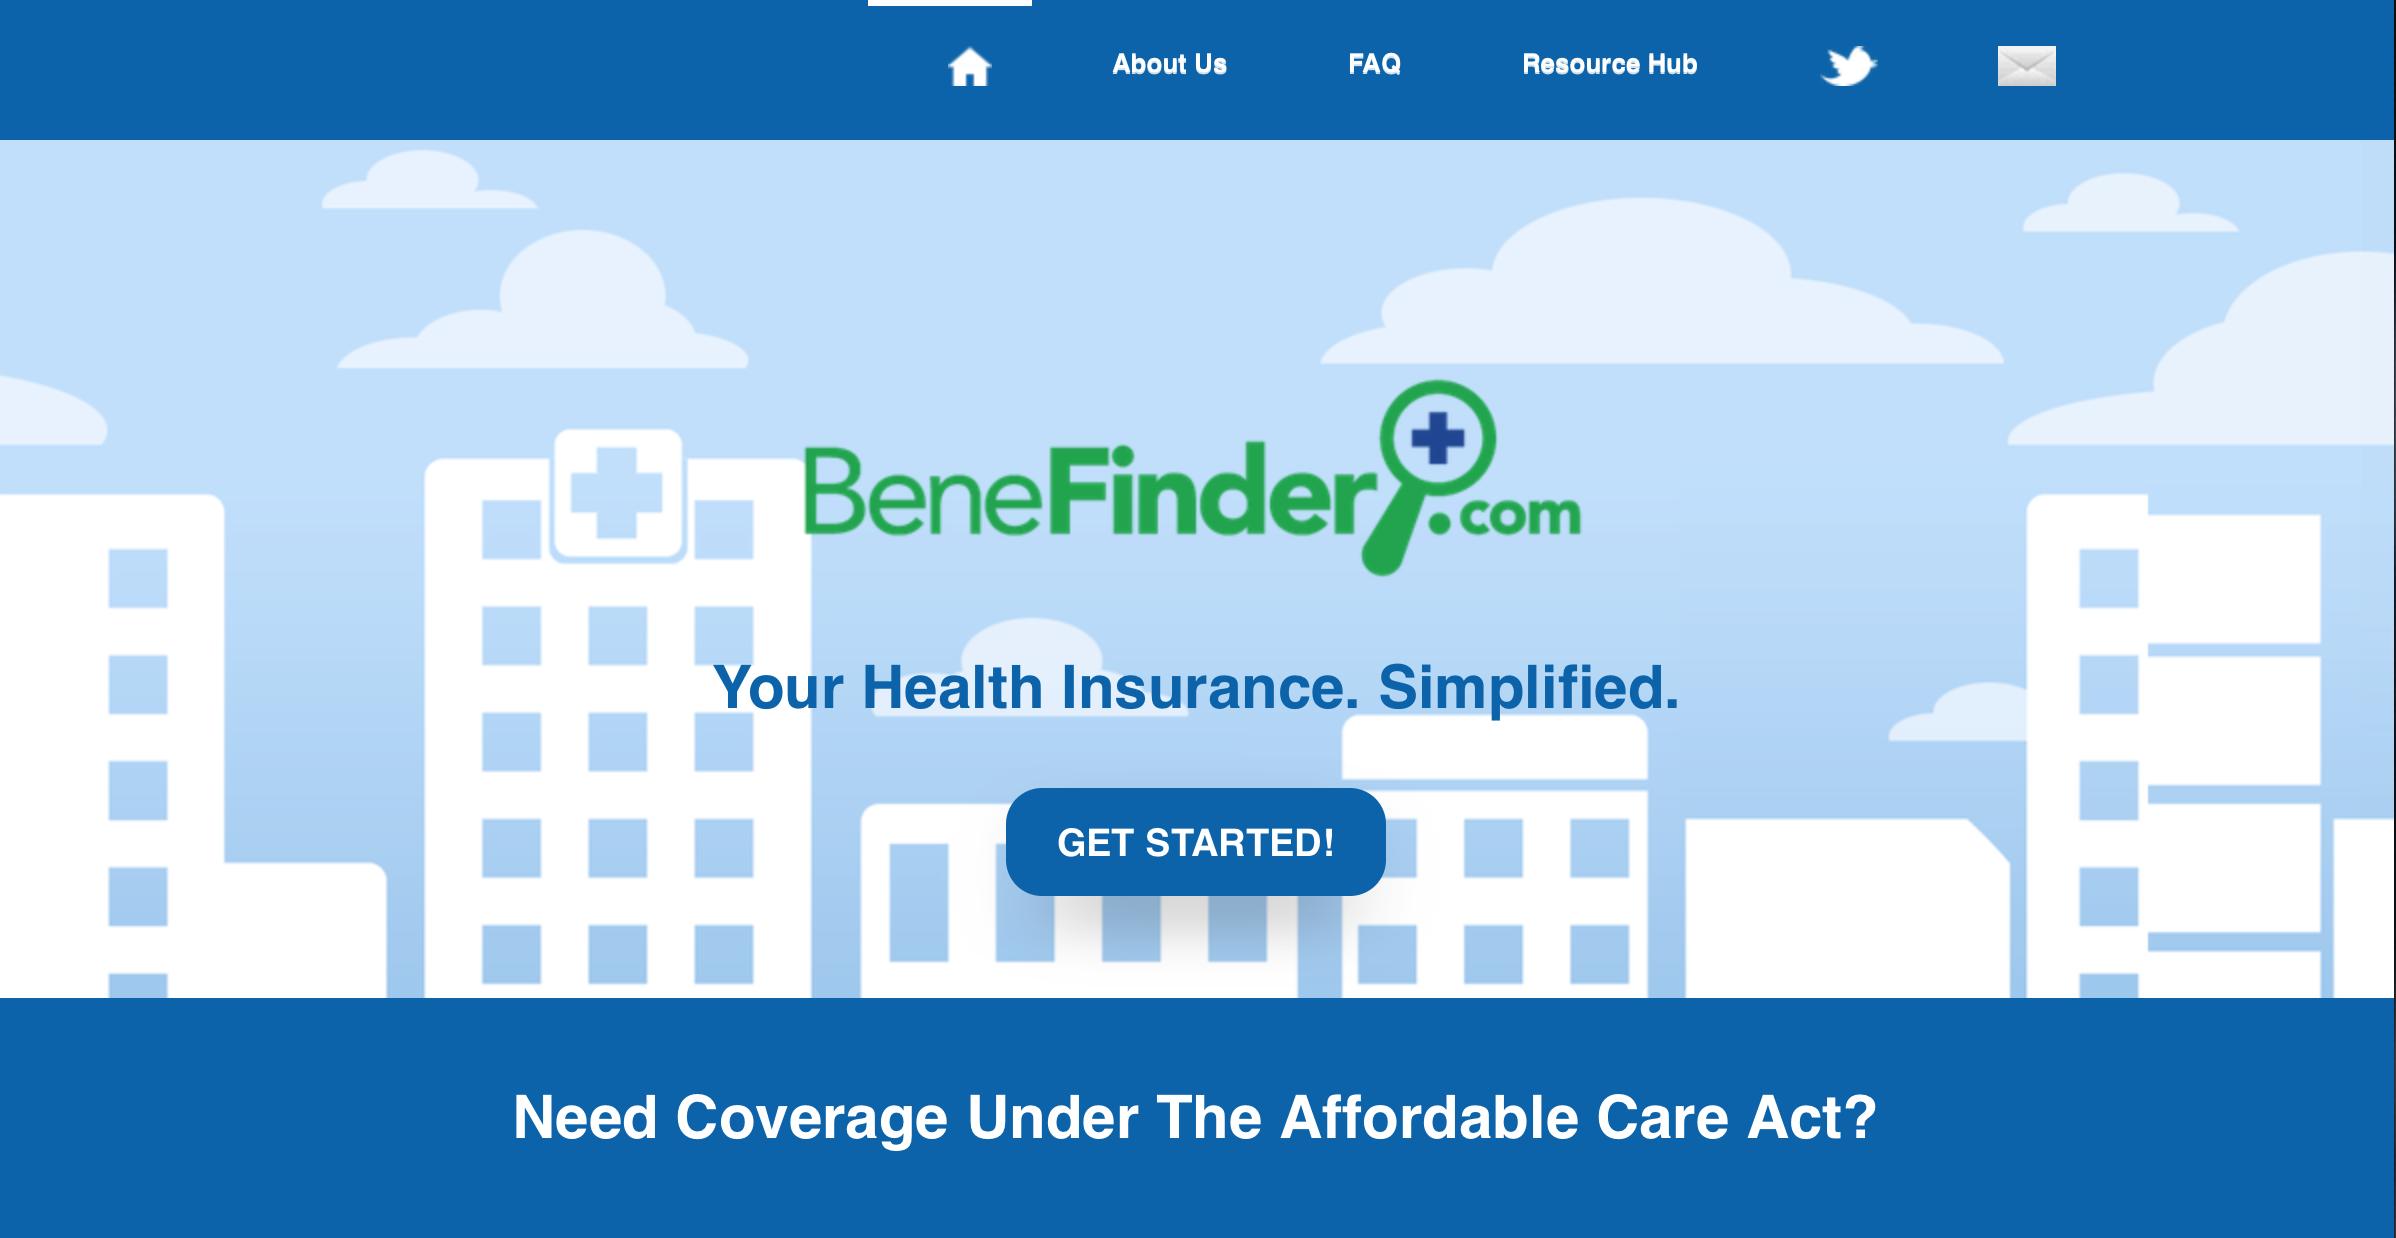 BeneFinder.com